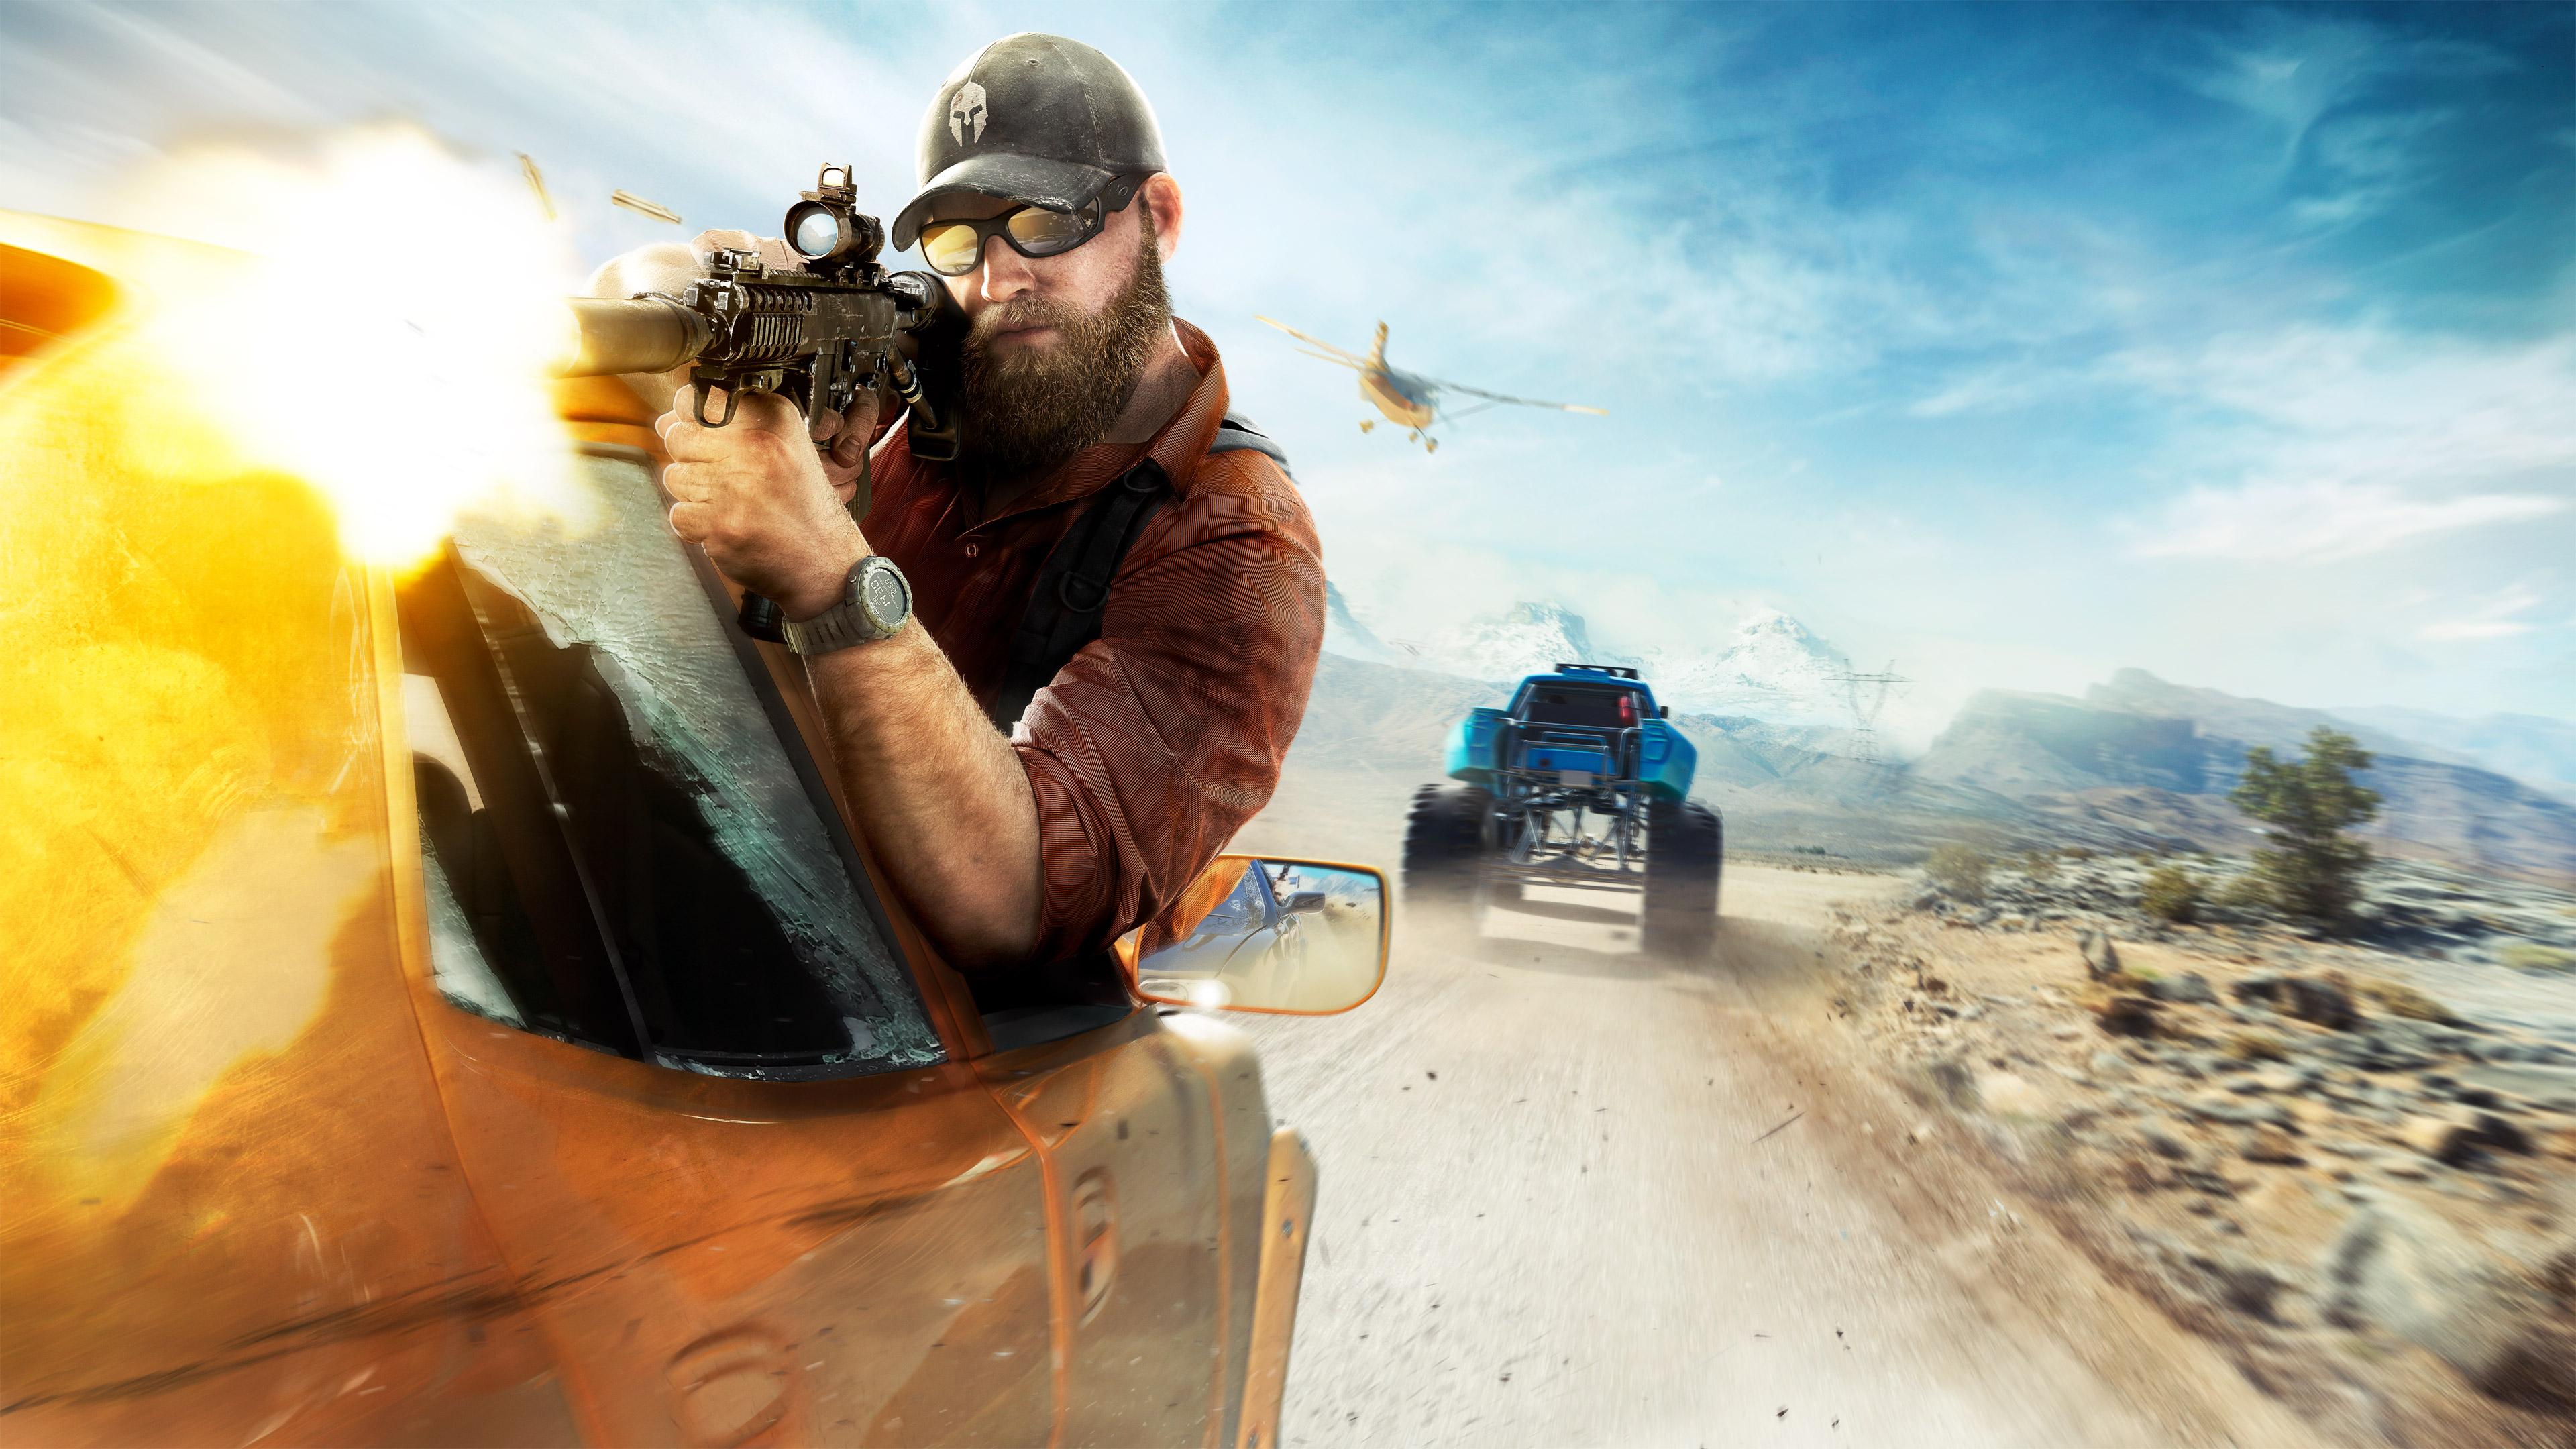 Tom Clancys Ghost Recon Wildlands 2017 Hd Games 4k: Narco Road Tom Clancys Ghost Recon Wildlands 8k, HD Games